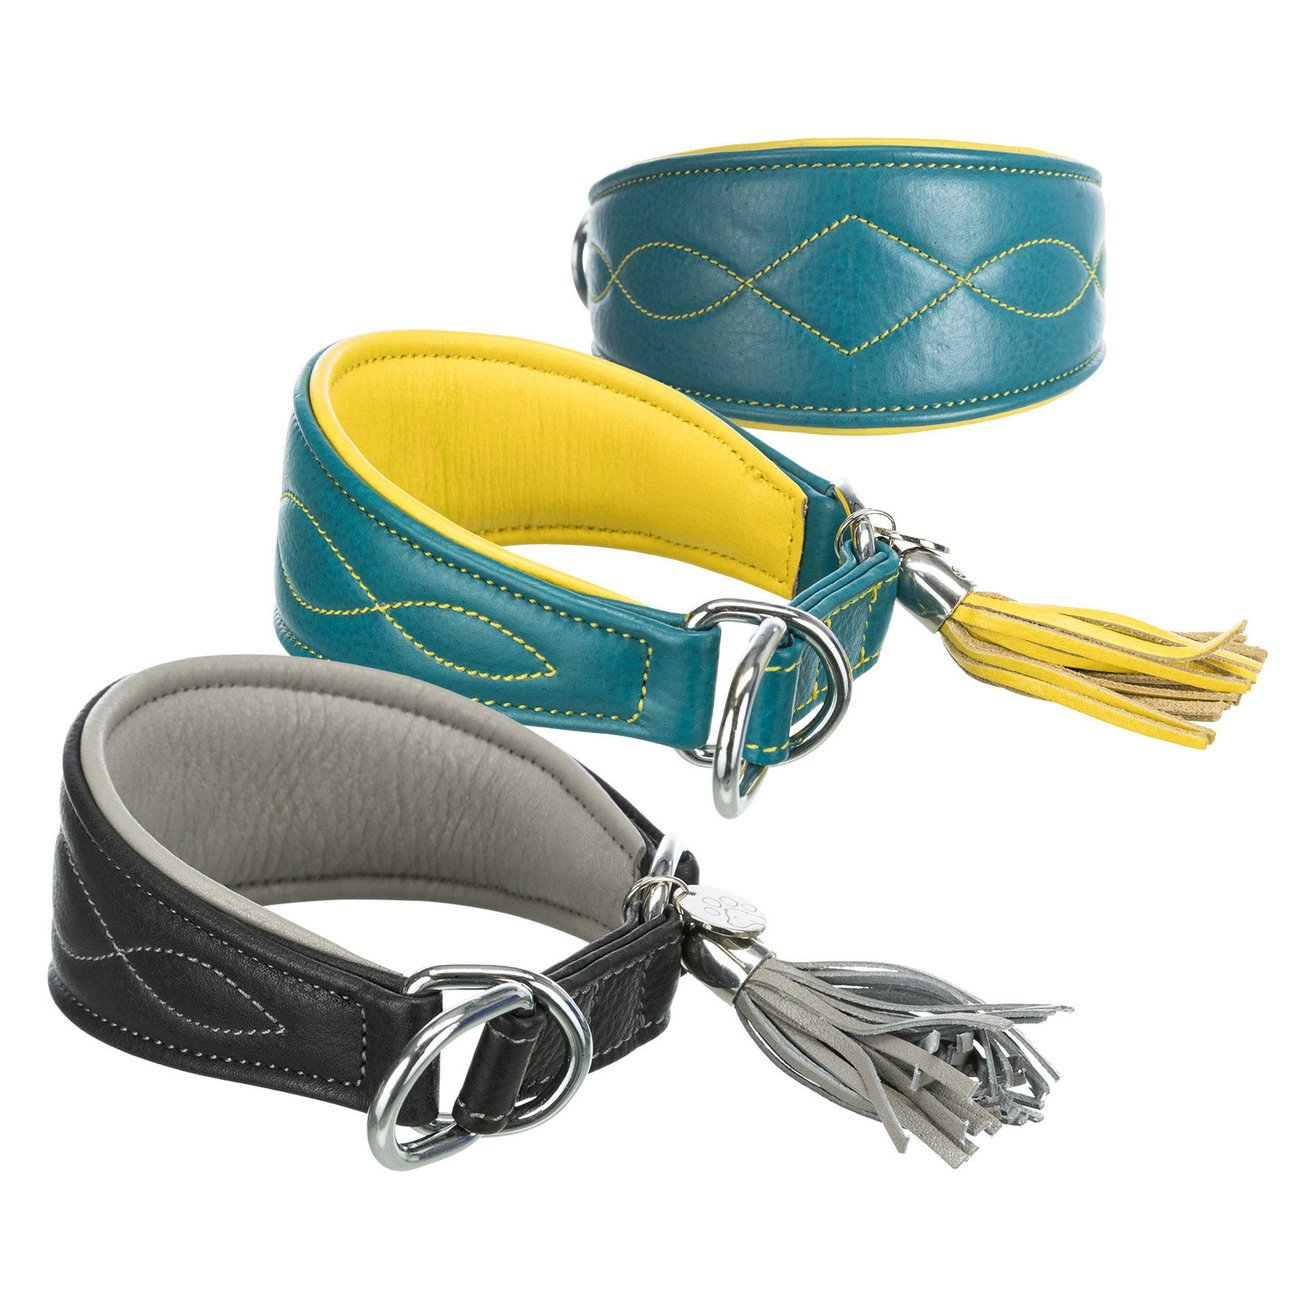 Active Comfort Windhundehalsband Bild 1